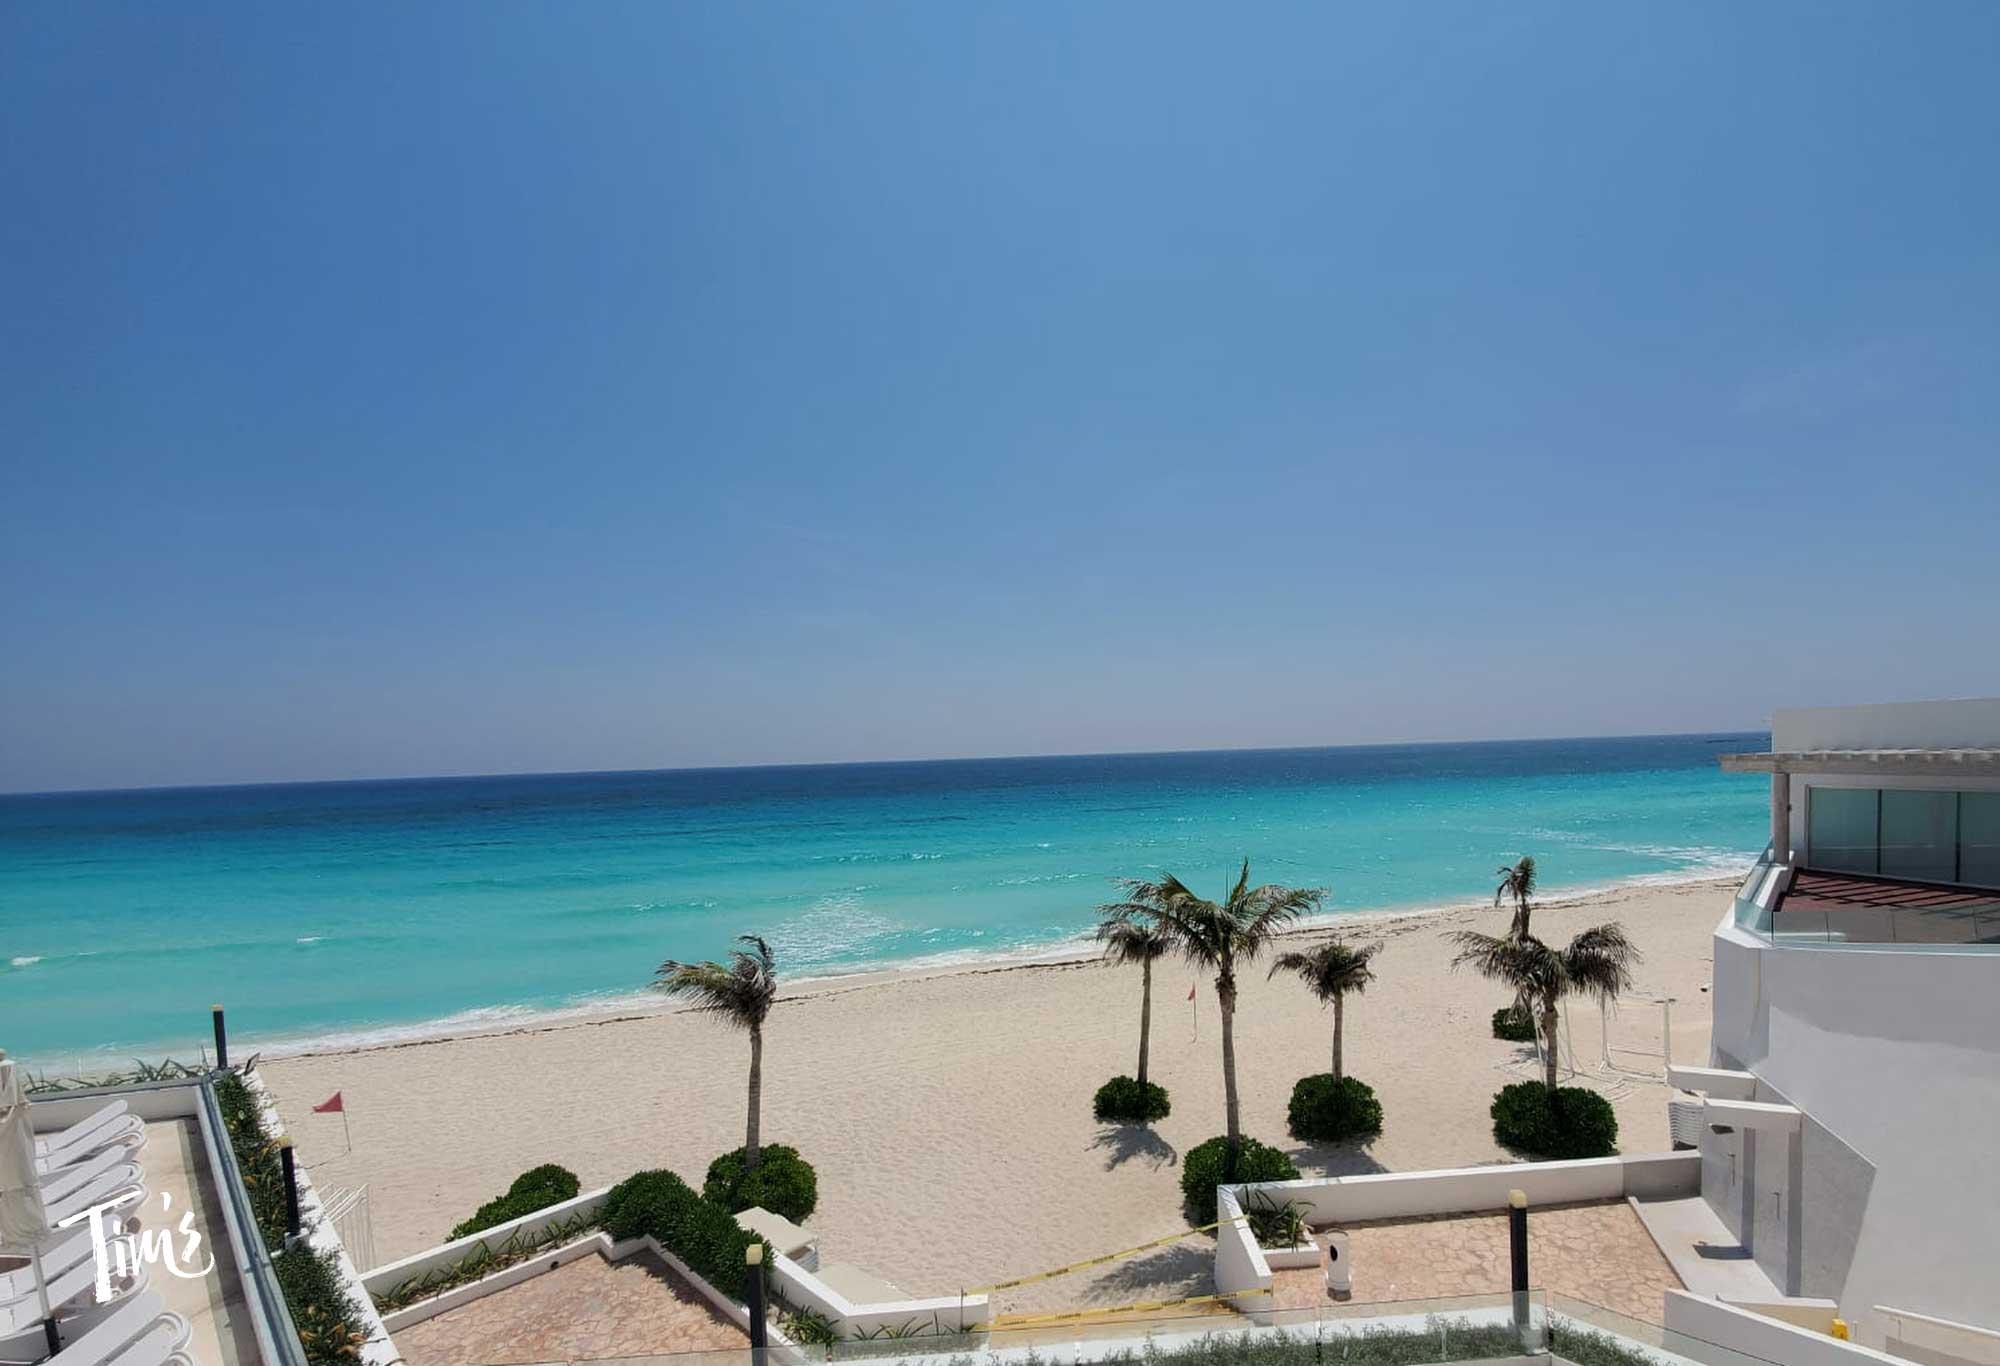 is Cancun open for spring break 2021